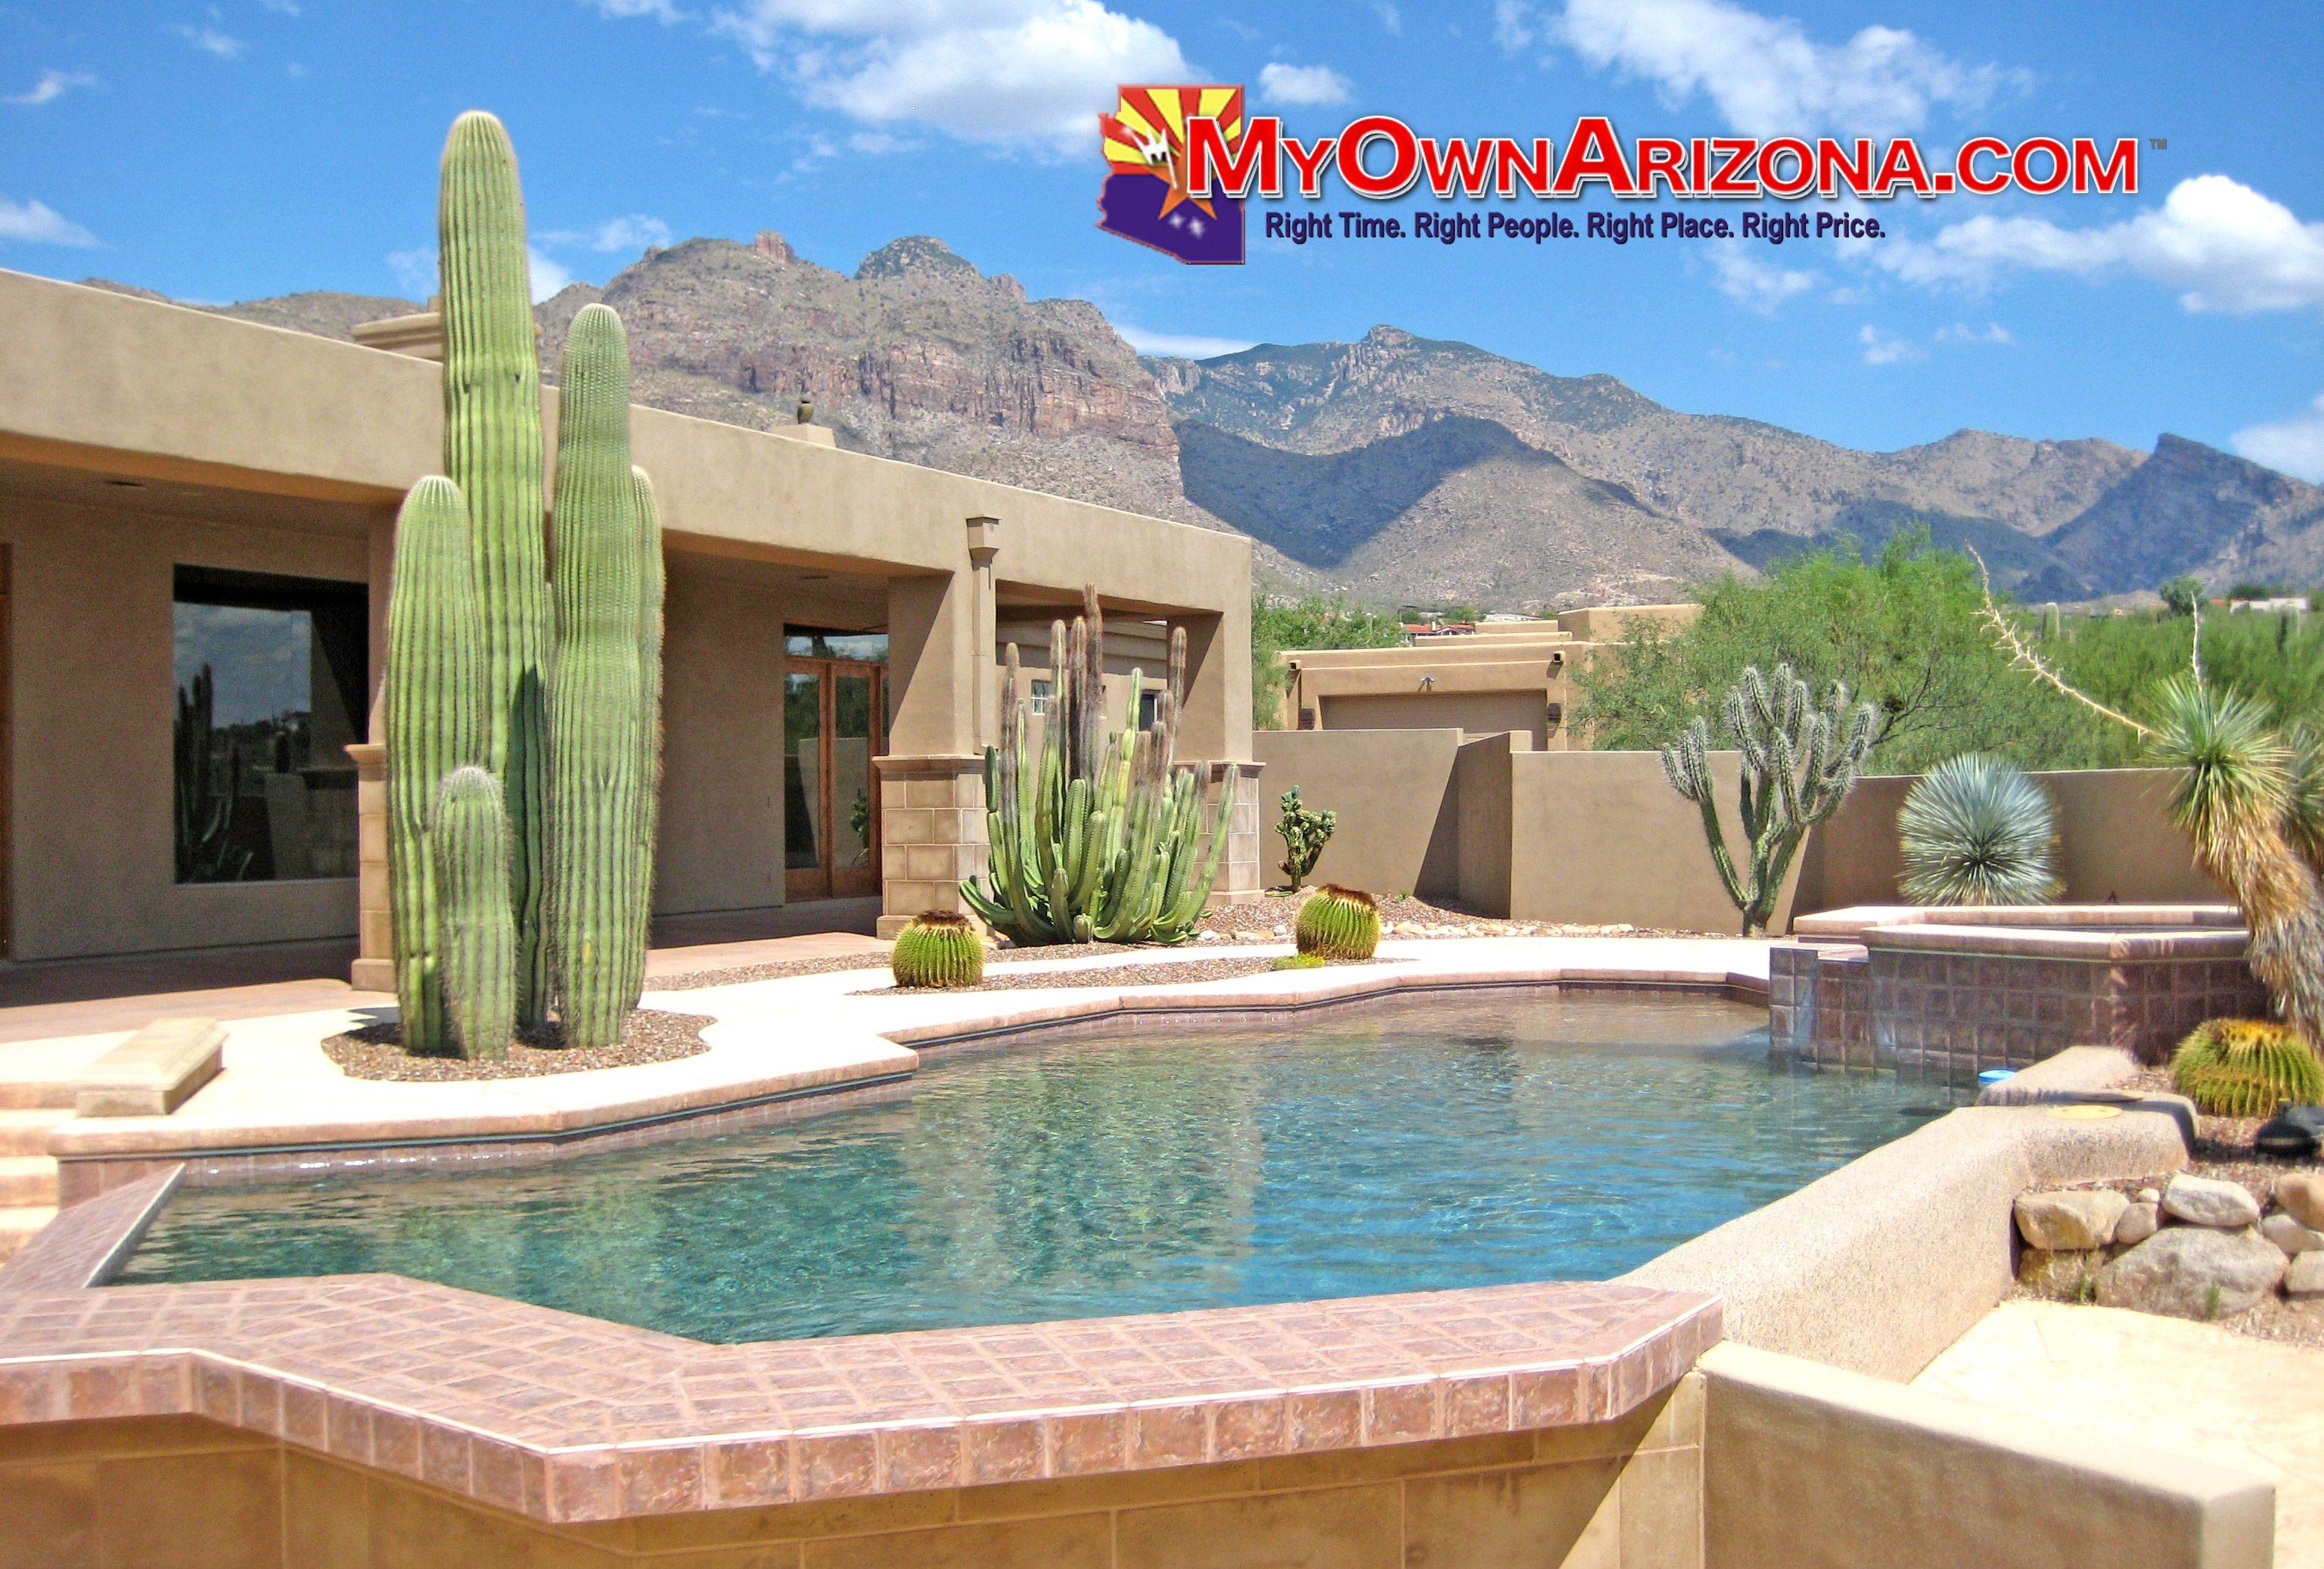 Rent Apartments In Tucson Az Apartments In Tucson Rio Seco Apartments Apartments For Rent In